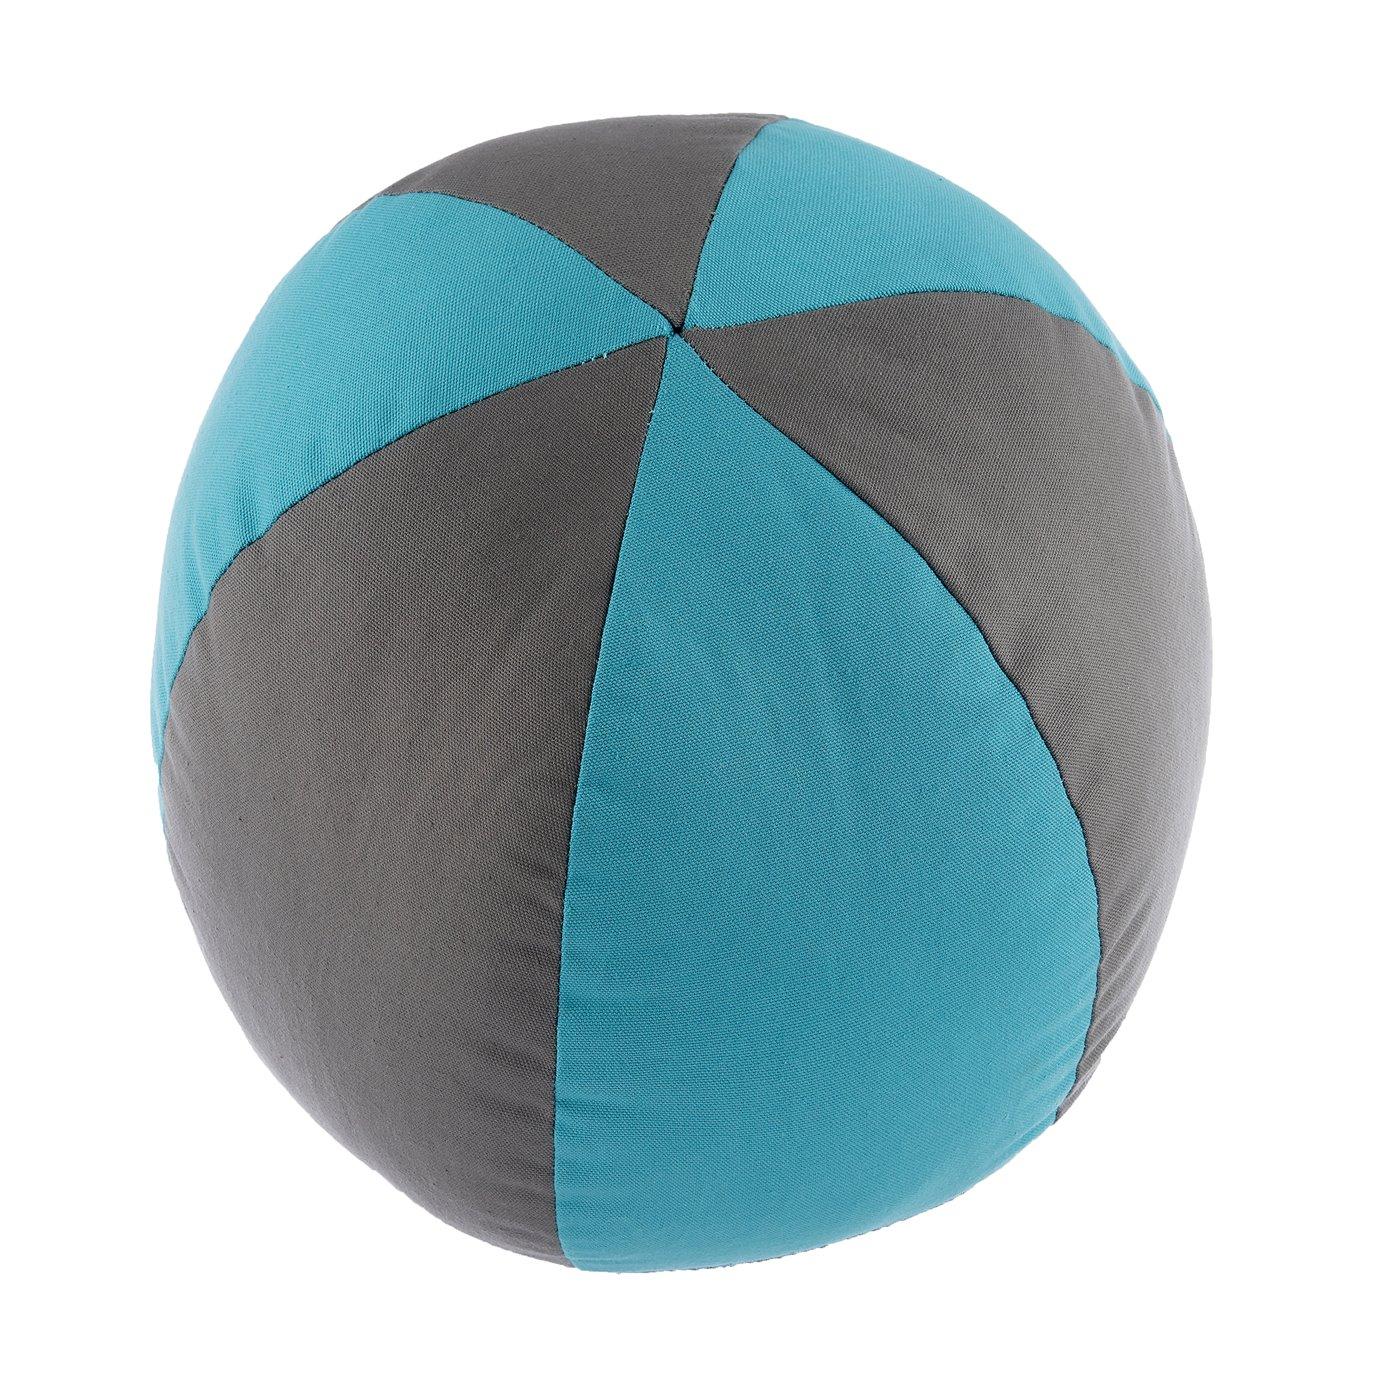 Seaside Treasures Caribbean Beach Ball Pillow - Grey/Peacock